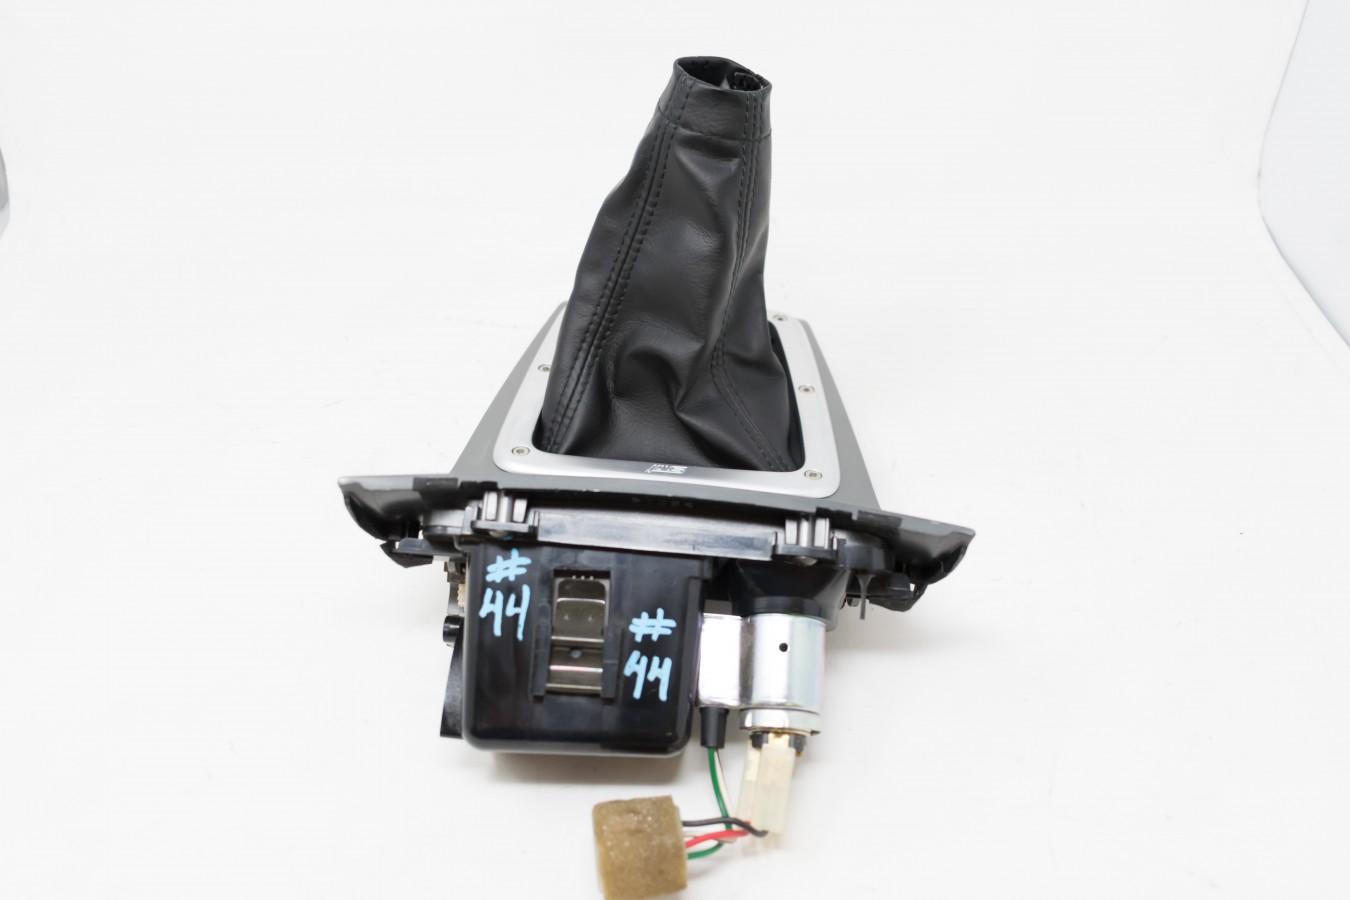 Used Subaru Wrx Sti >> Used Ver.9 Subaru Impreza STI OEM Shifter Trim with Shift Boot for sale. | Shifters, Knobs ...